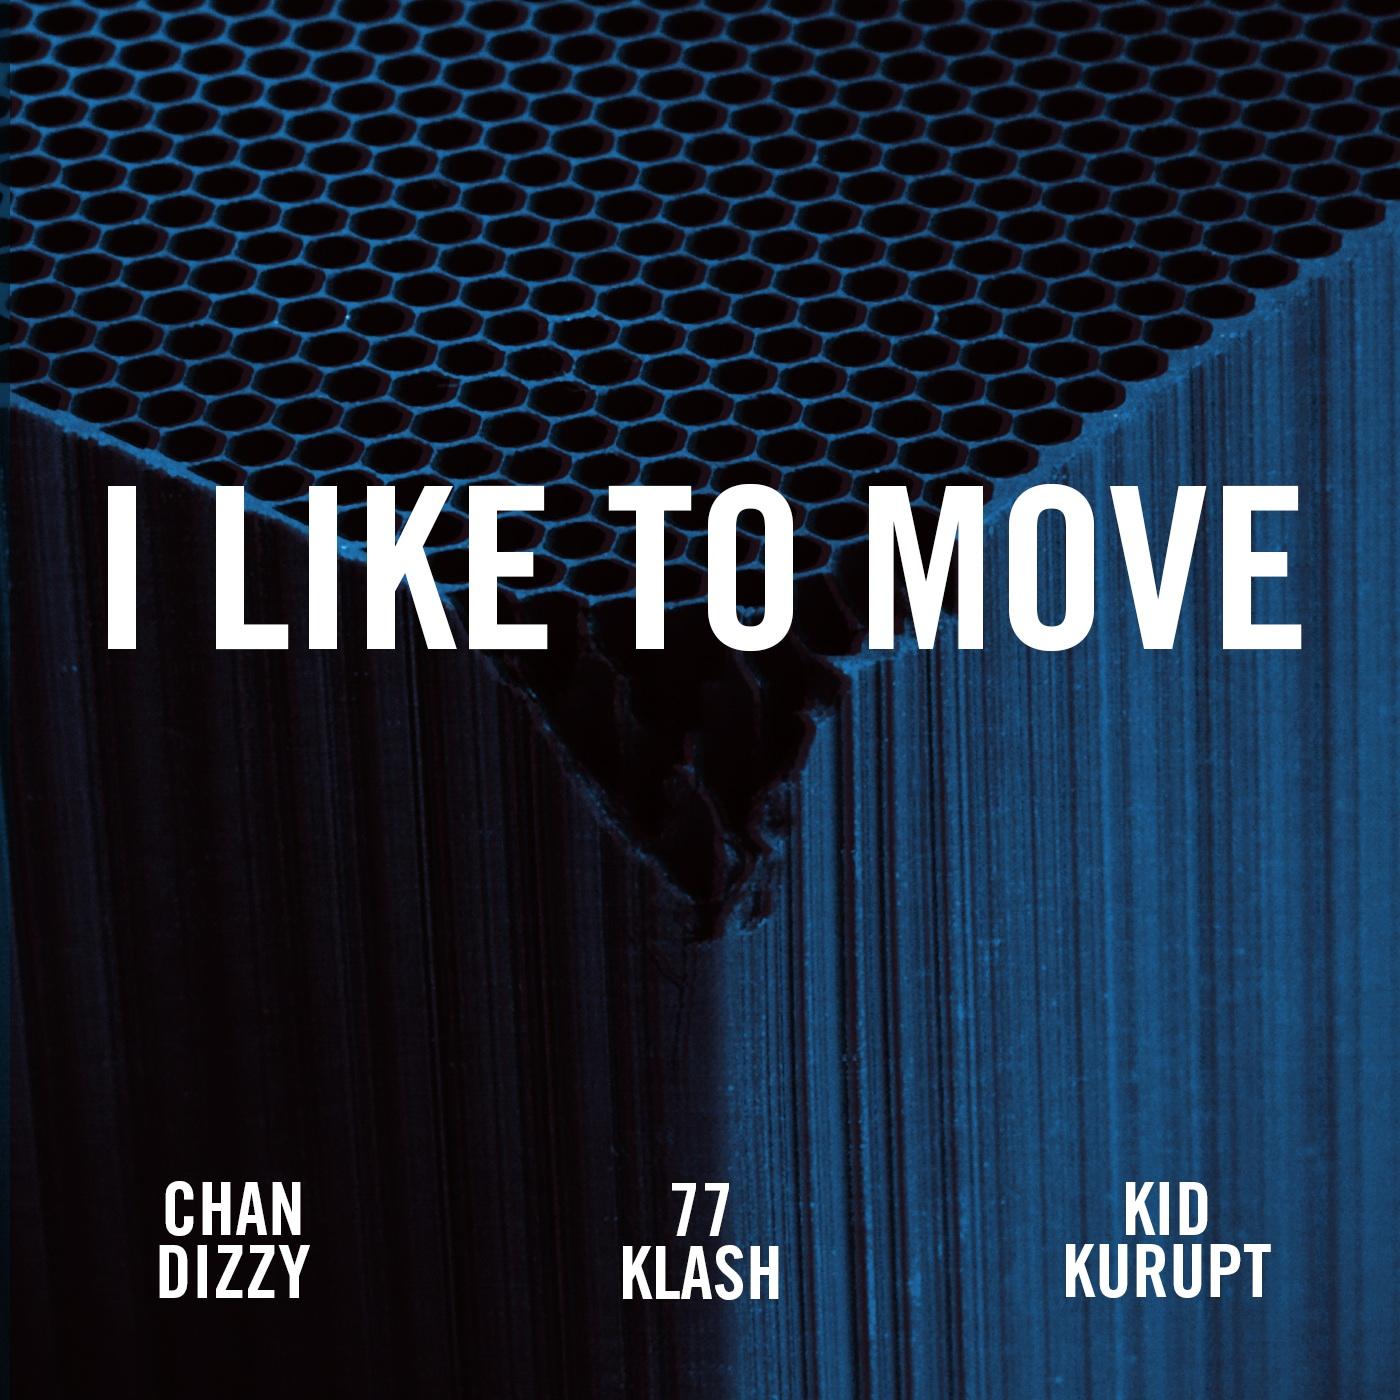 Matt Shadetek feat. Chan Dizzy, 77 Klash and Kid Kurupt - I Like To Move